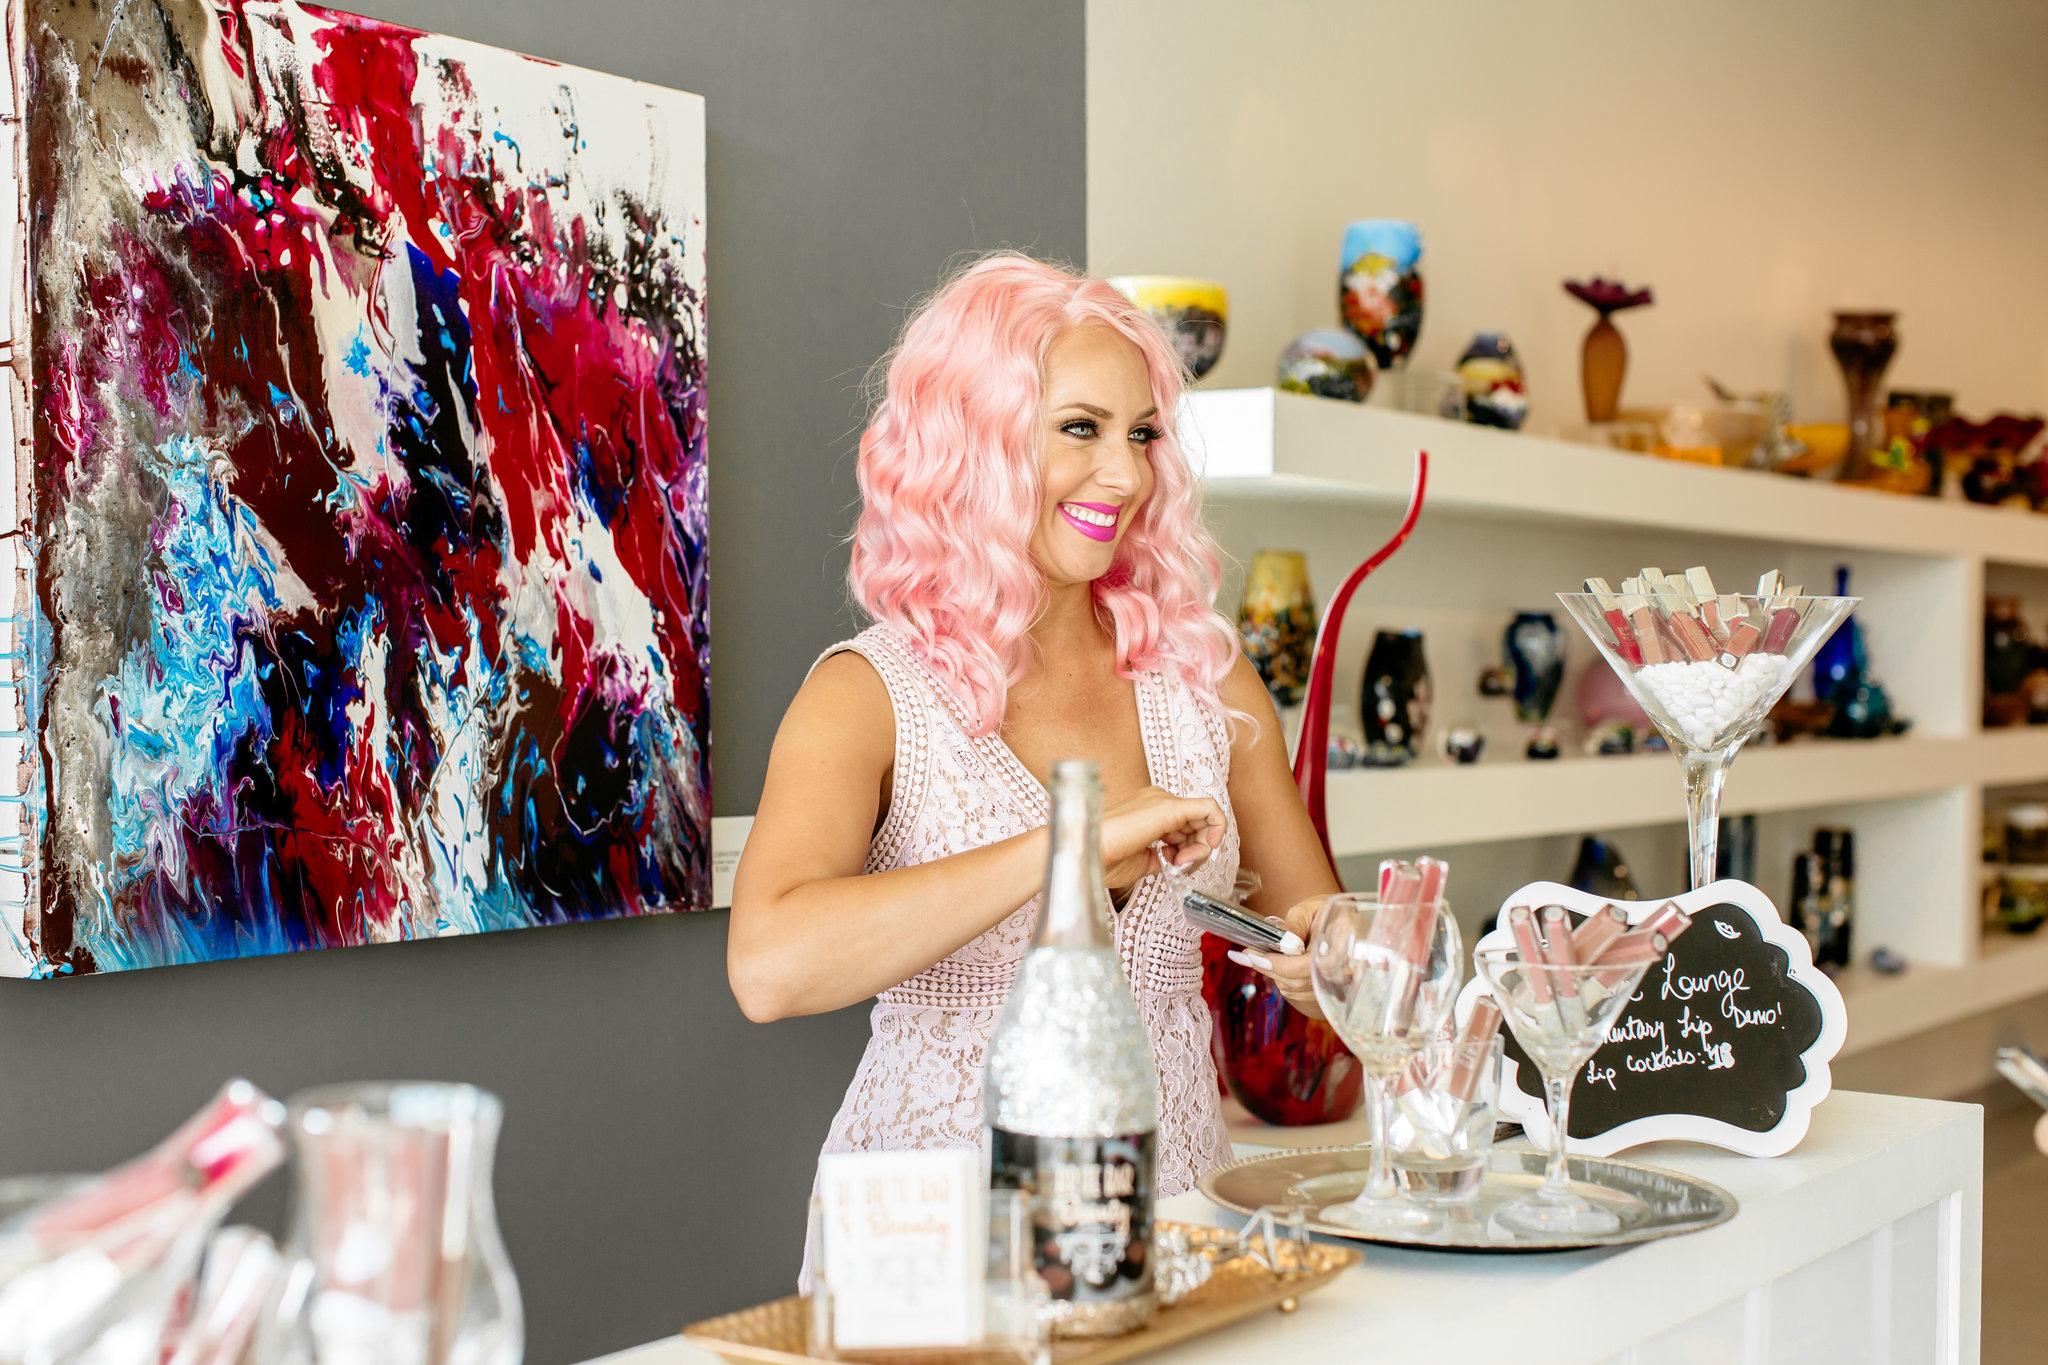 Alexa-Vossler-Photo_Dallas-Event-Photographer_Brite-Bar-Beauty-2018-Lipstick-Launch-Party-5.jpg